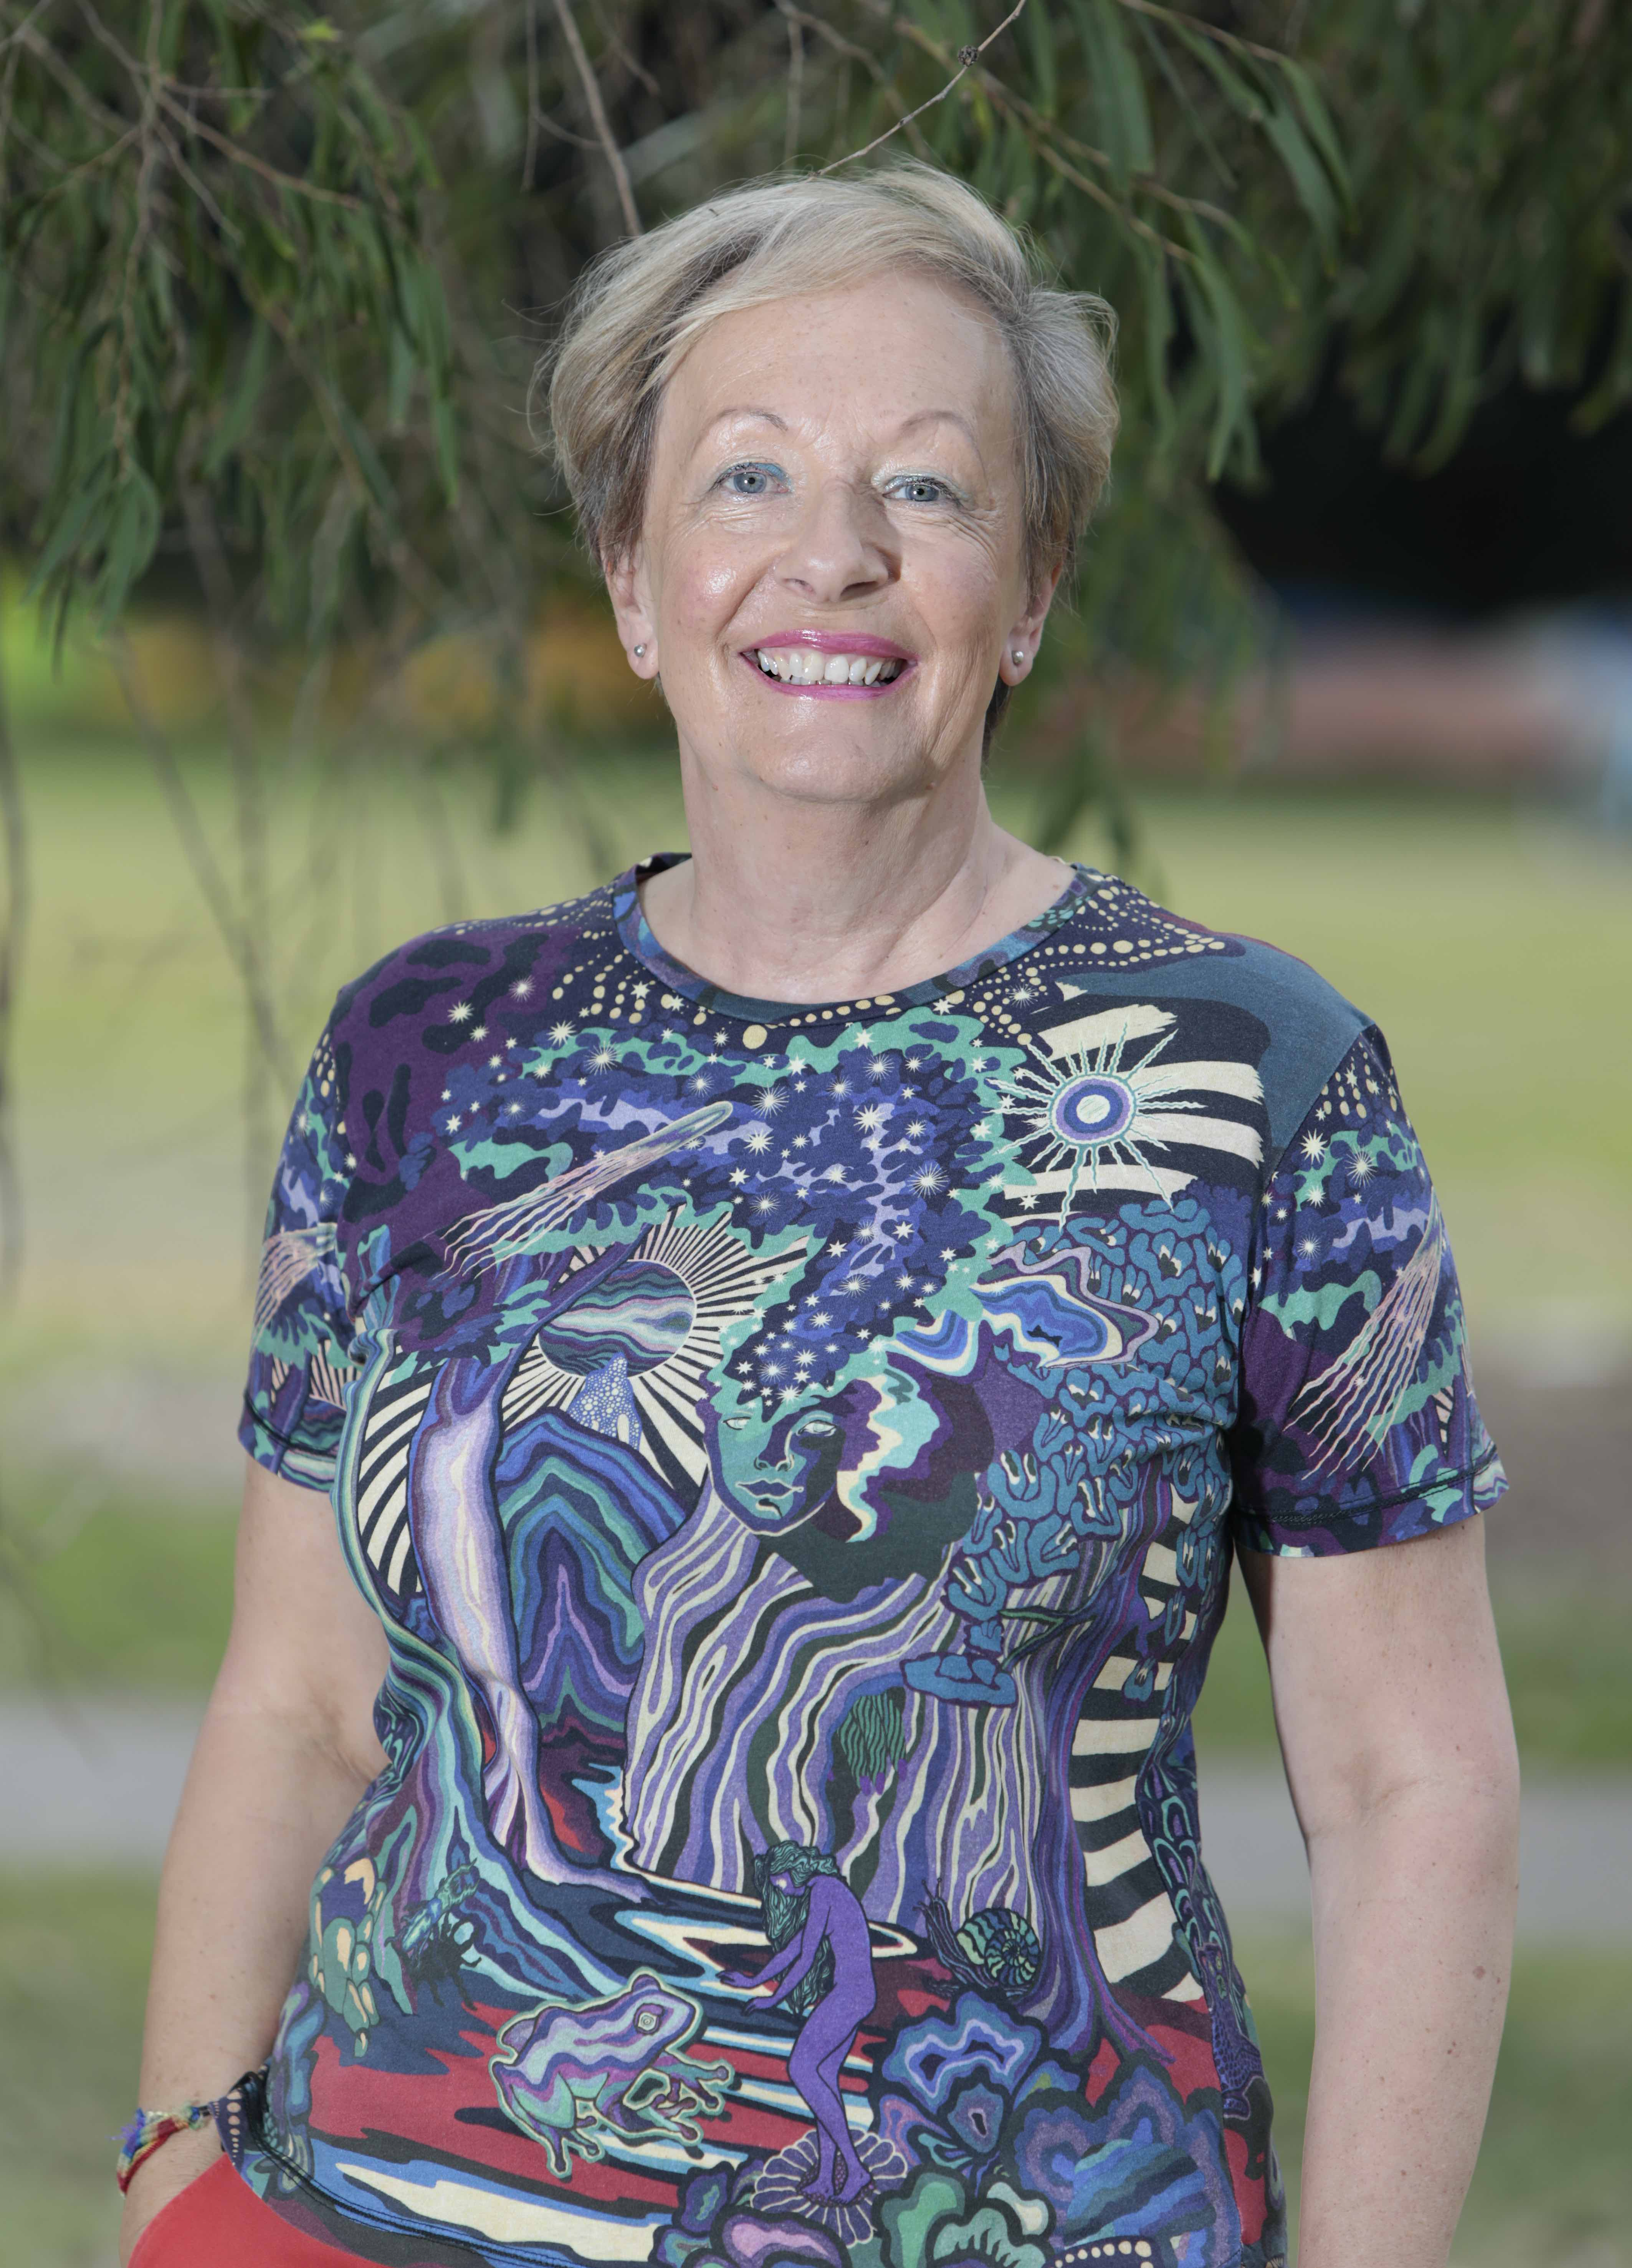 Elaine Czulkowski